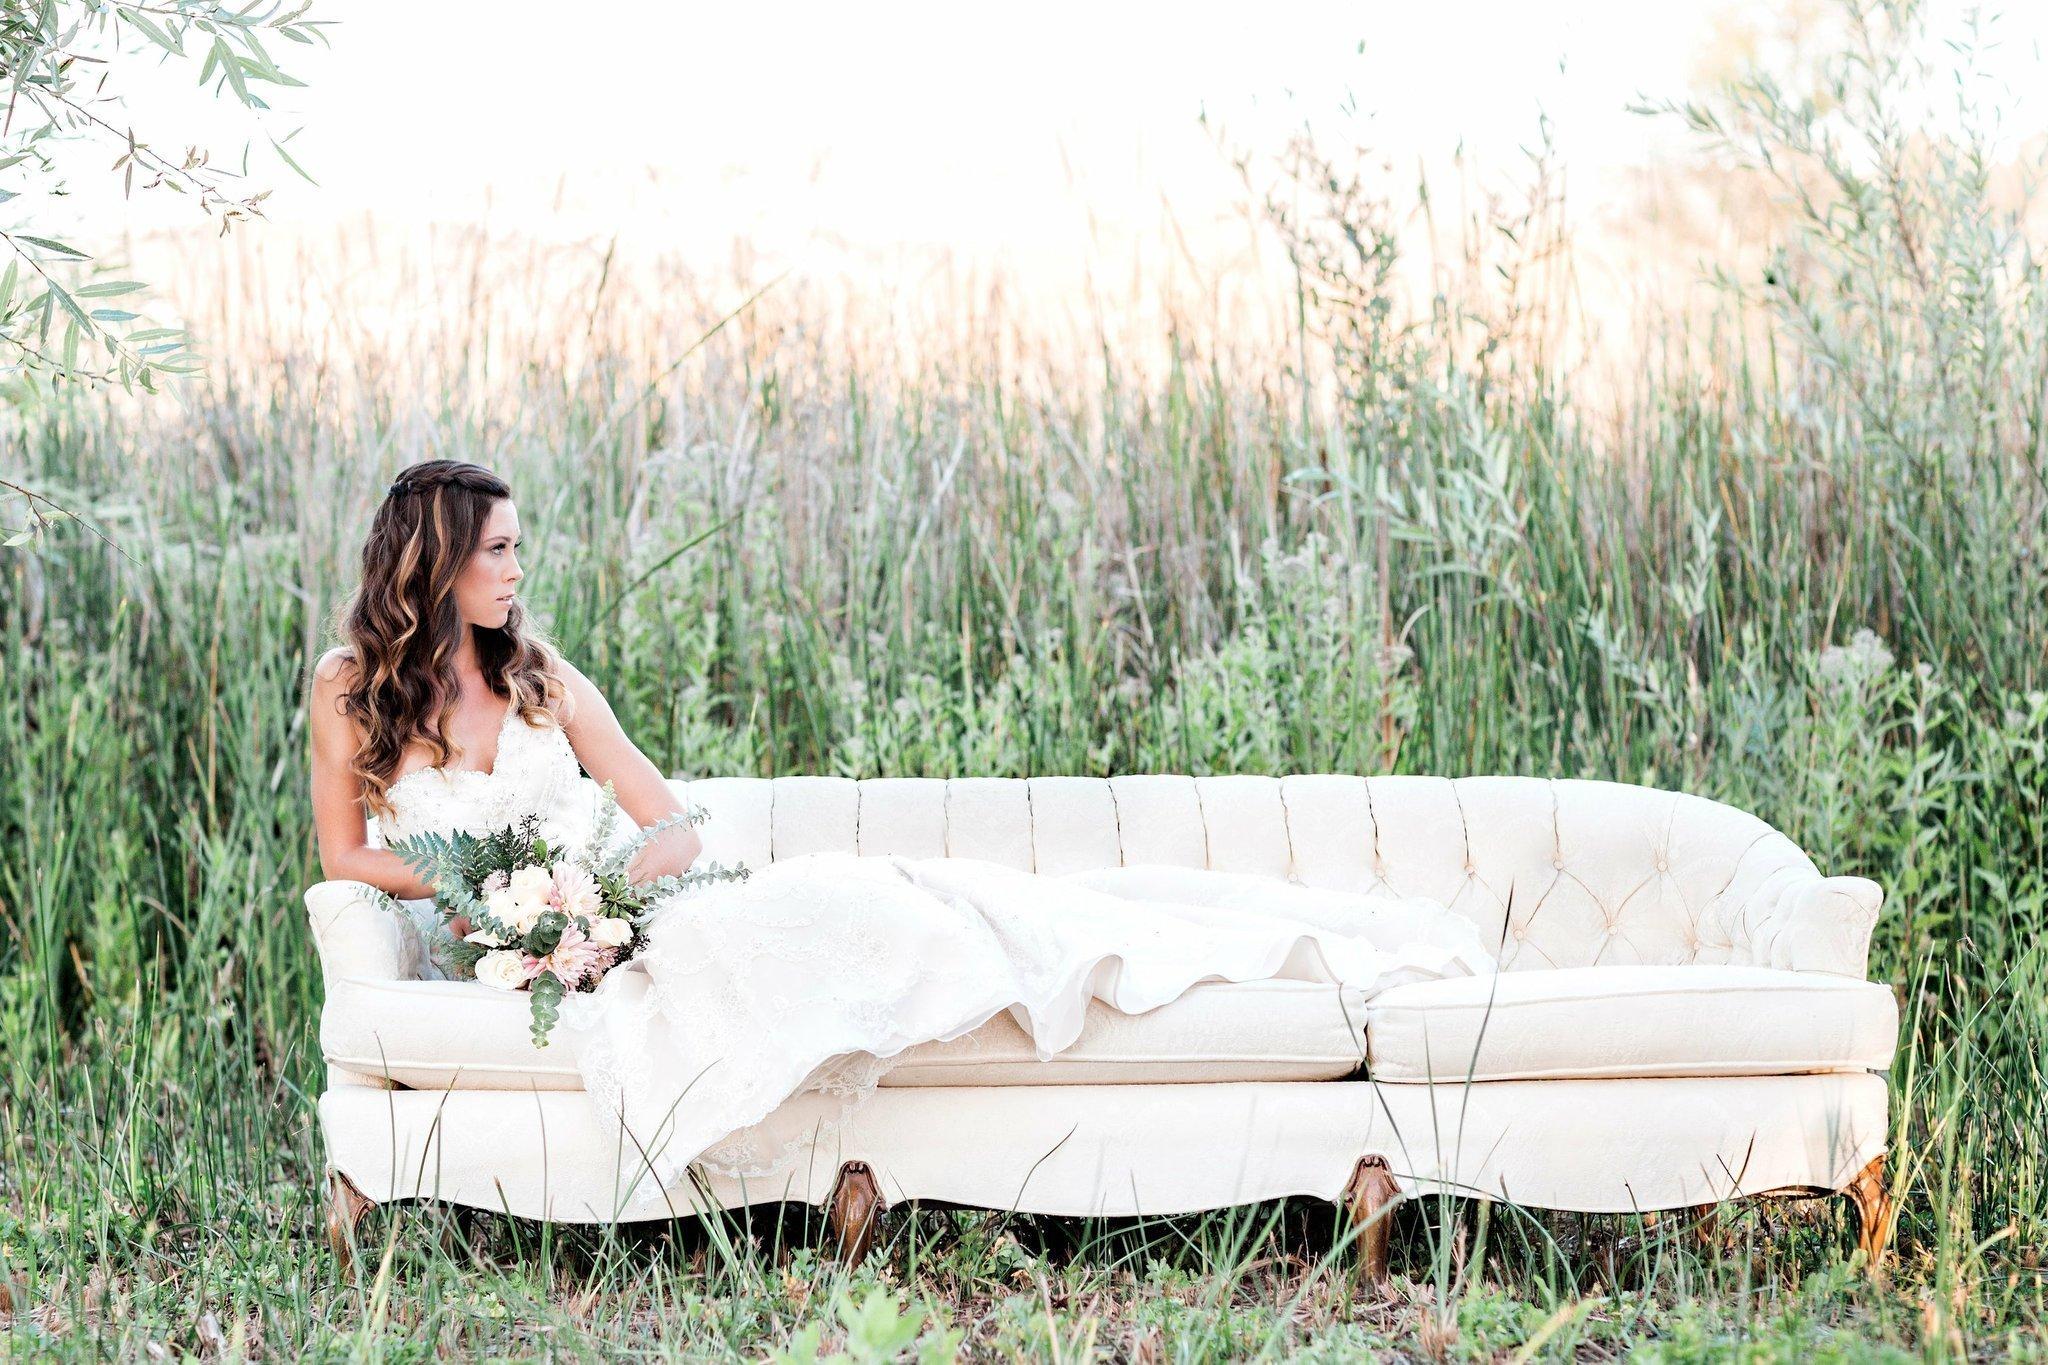 Saving money on a wedding - The San Diego Union-Tribune